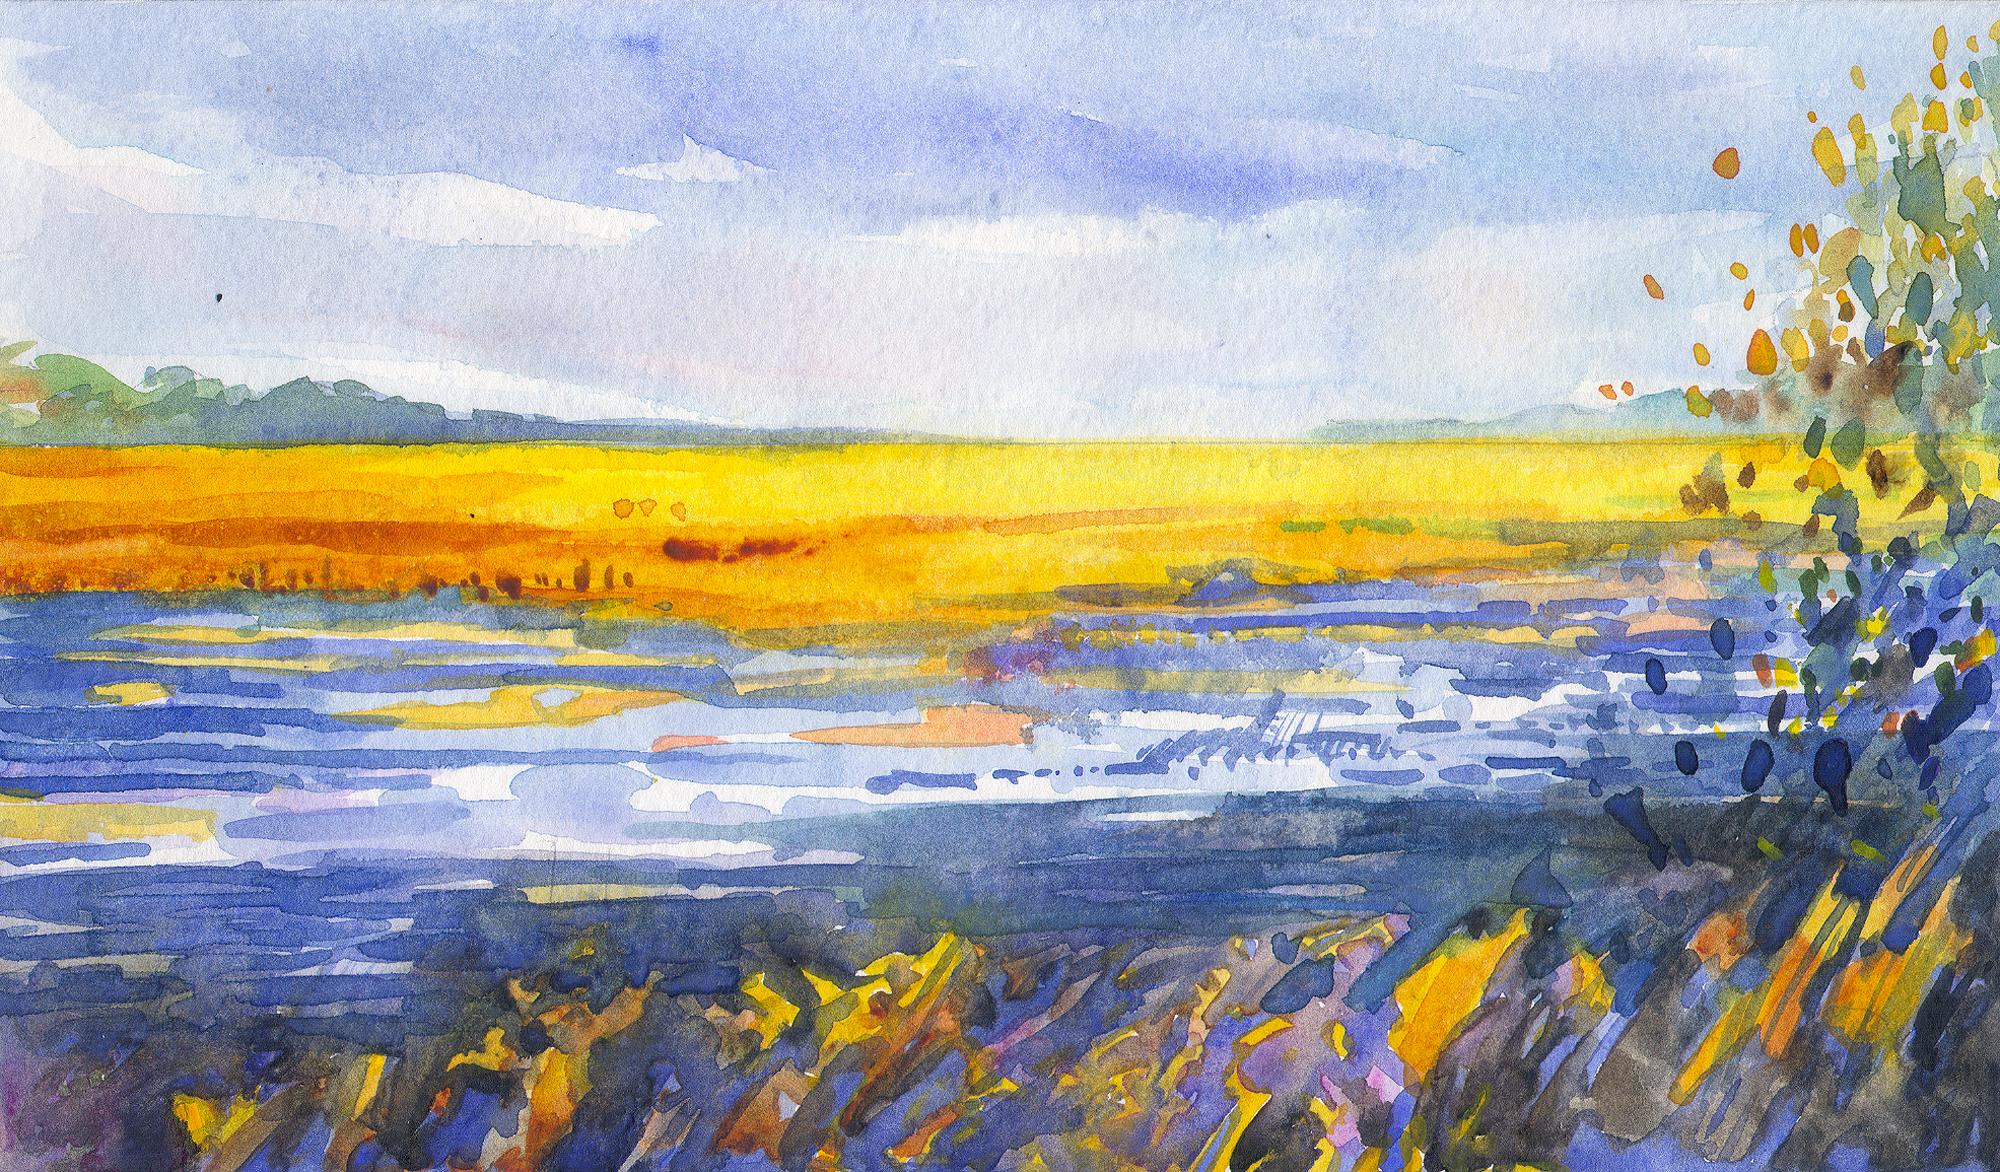 Salt Marshes, Hobcaw Barony, SC